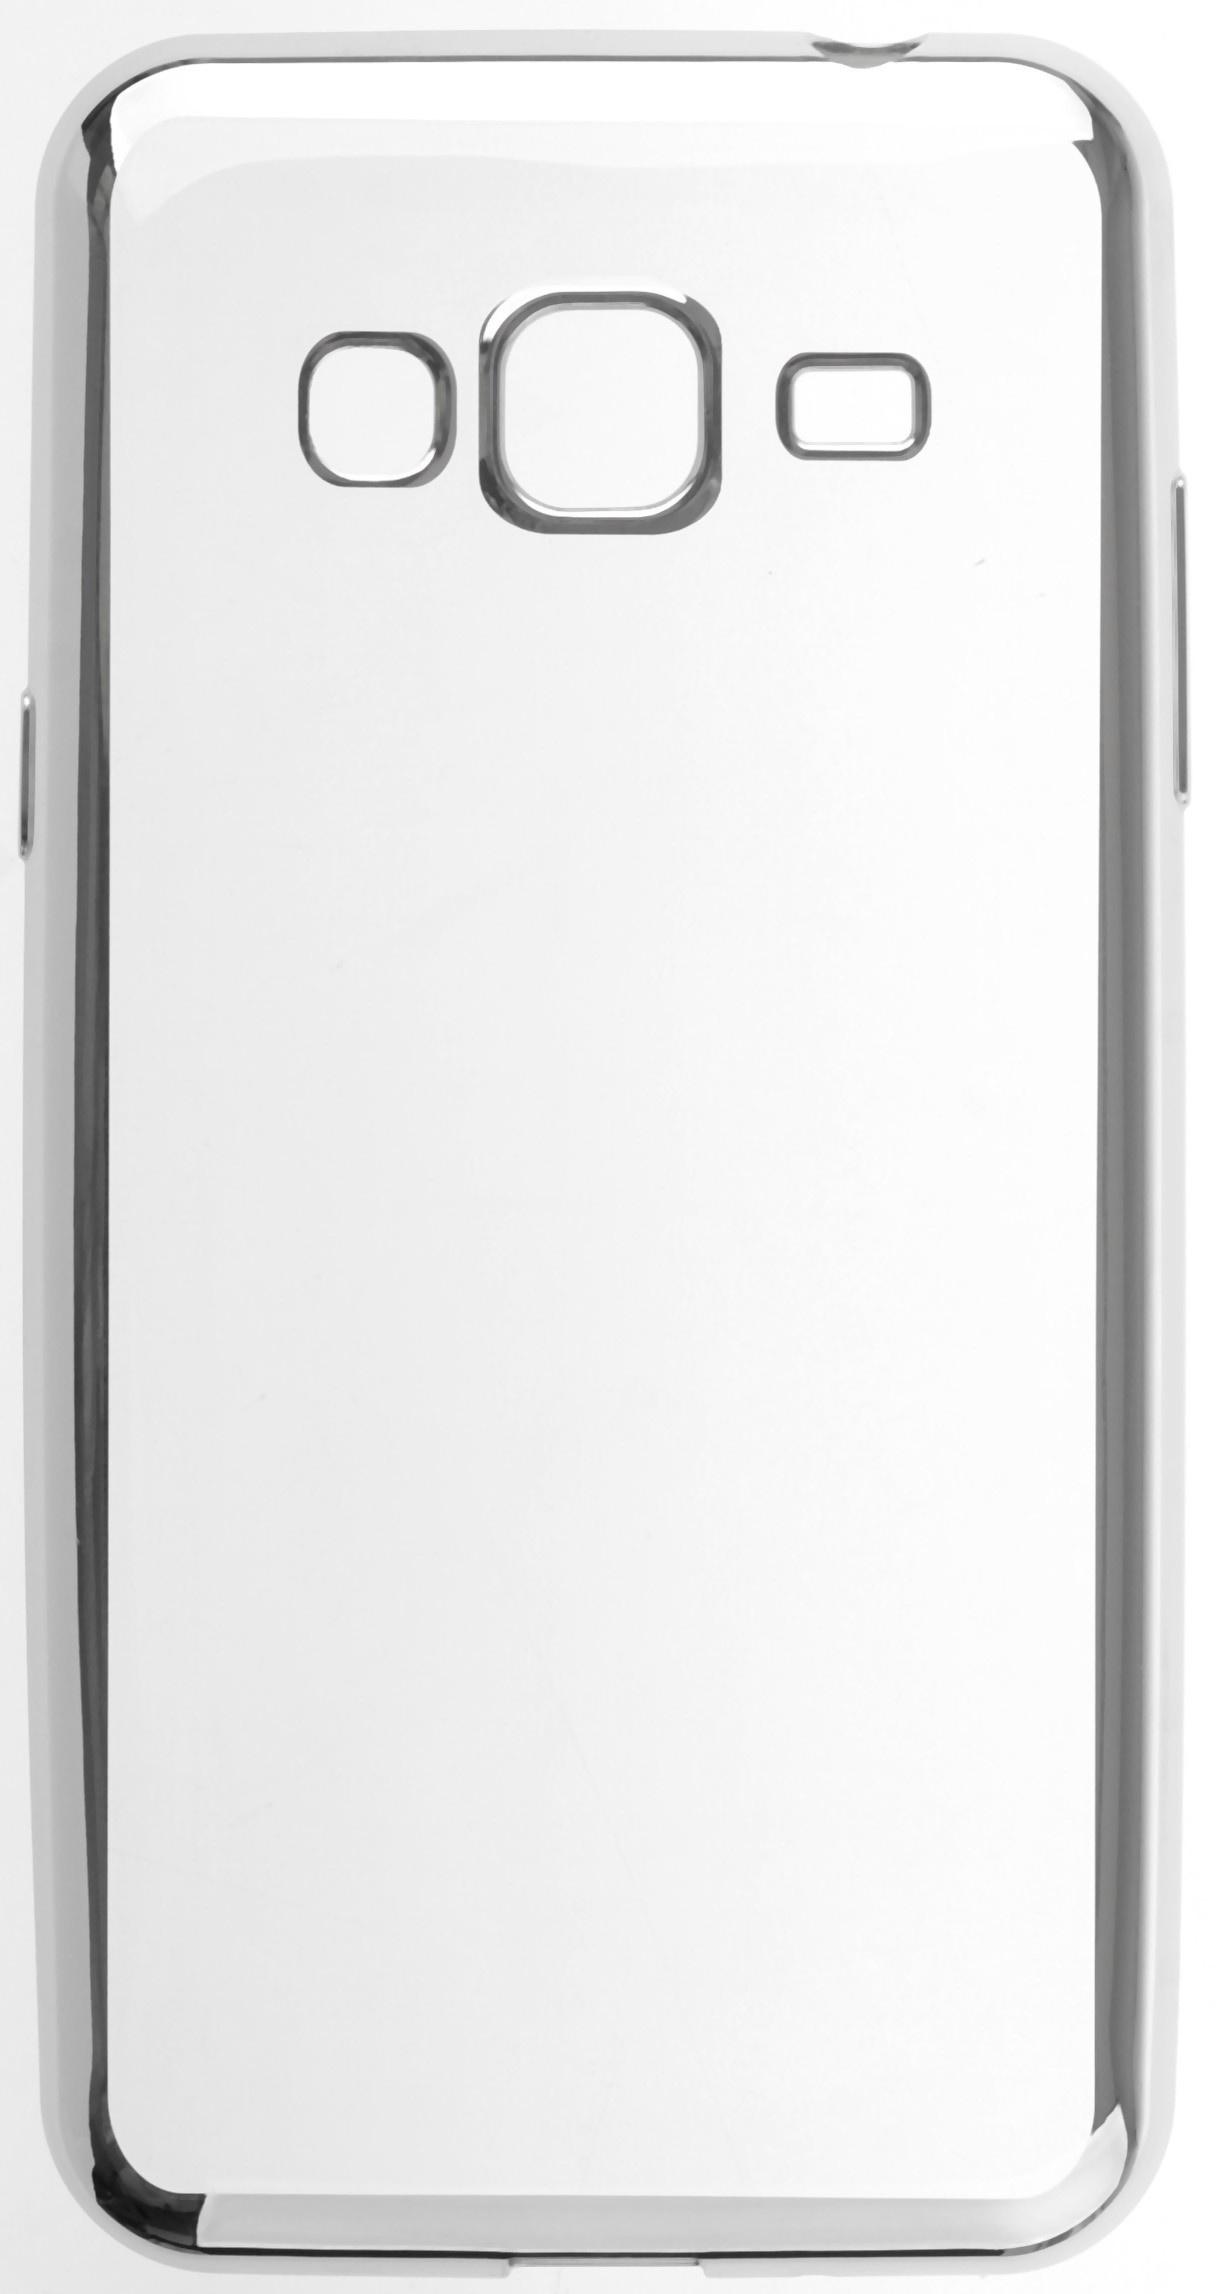 Чехол для сотового телефона skinBOX Silicone chrome border, 4630042528680, серебристый чехол для сотового телефона skinbox silicone chrome border 4630042528697 серебристый